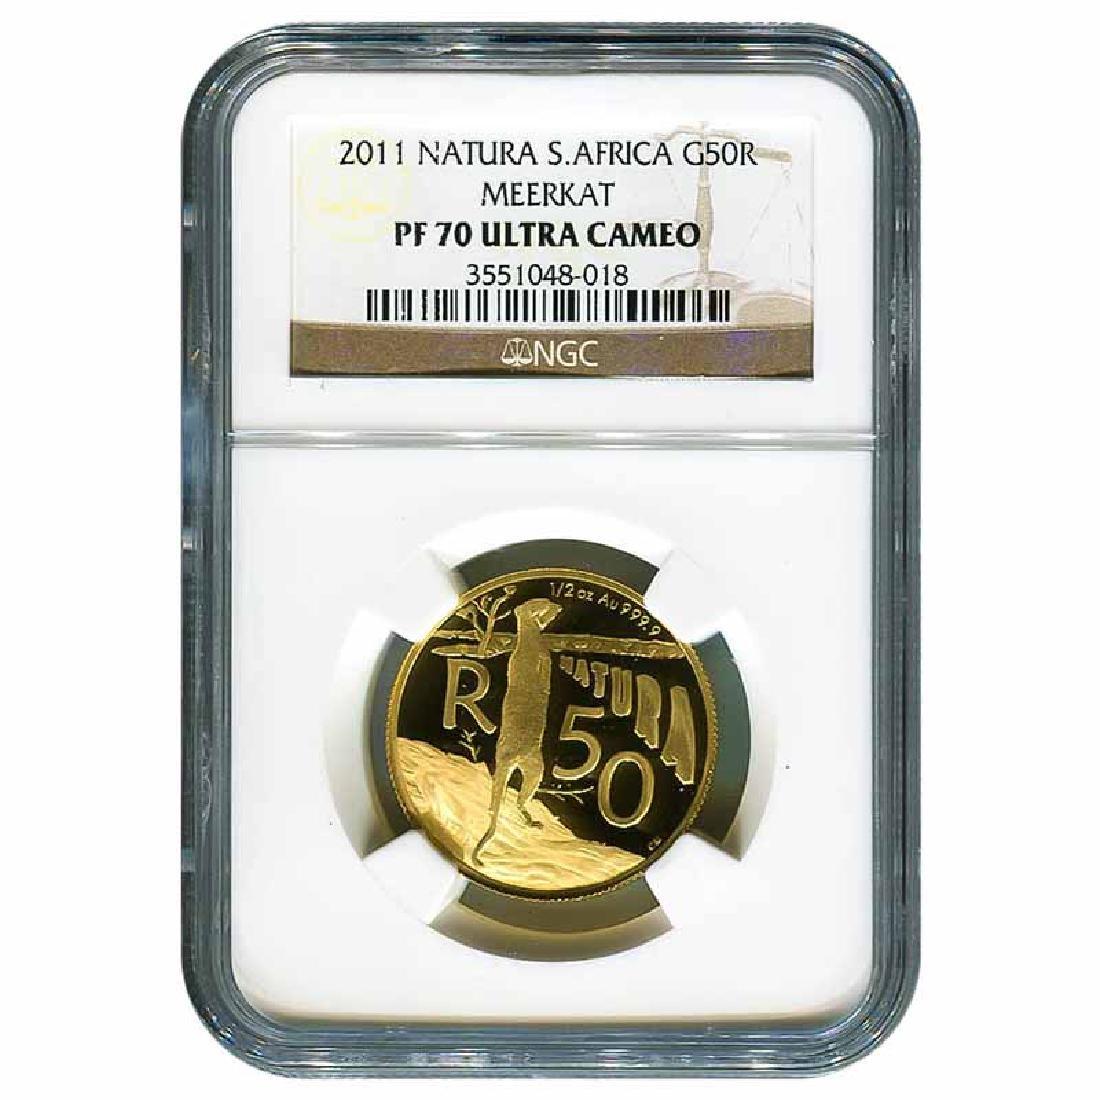 Certified South African Gold 2011 Natura Series Meerkat